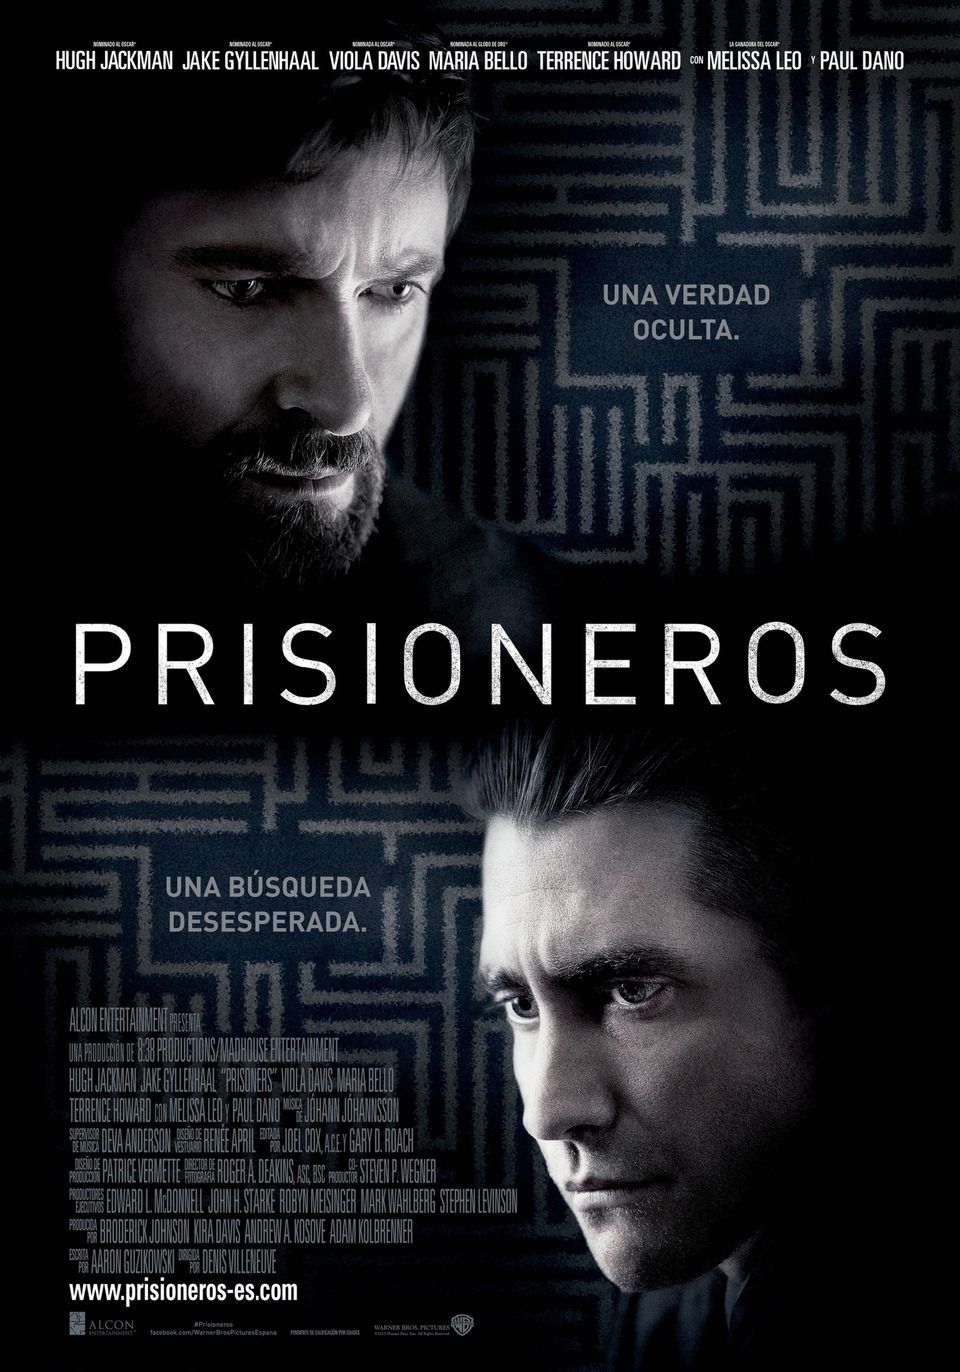 España 2 poster for Prisoners